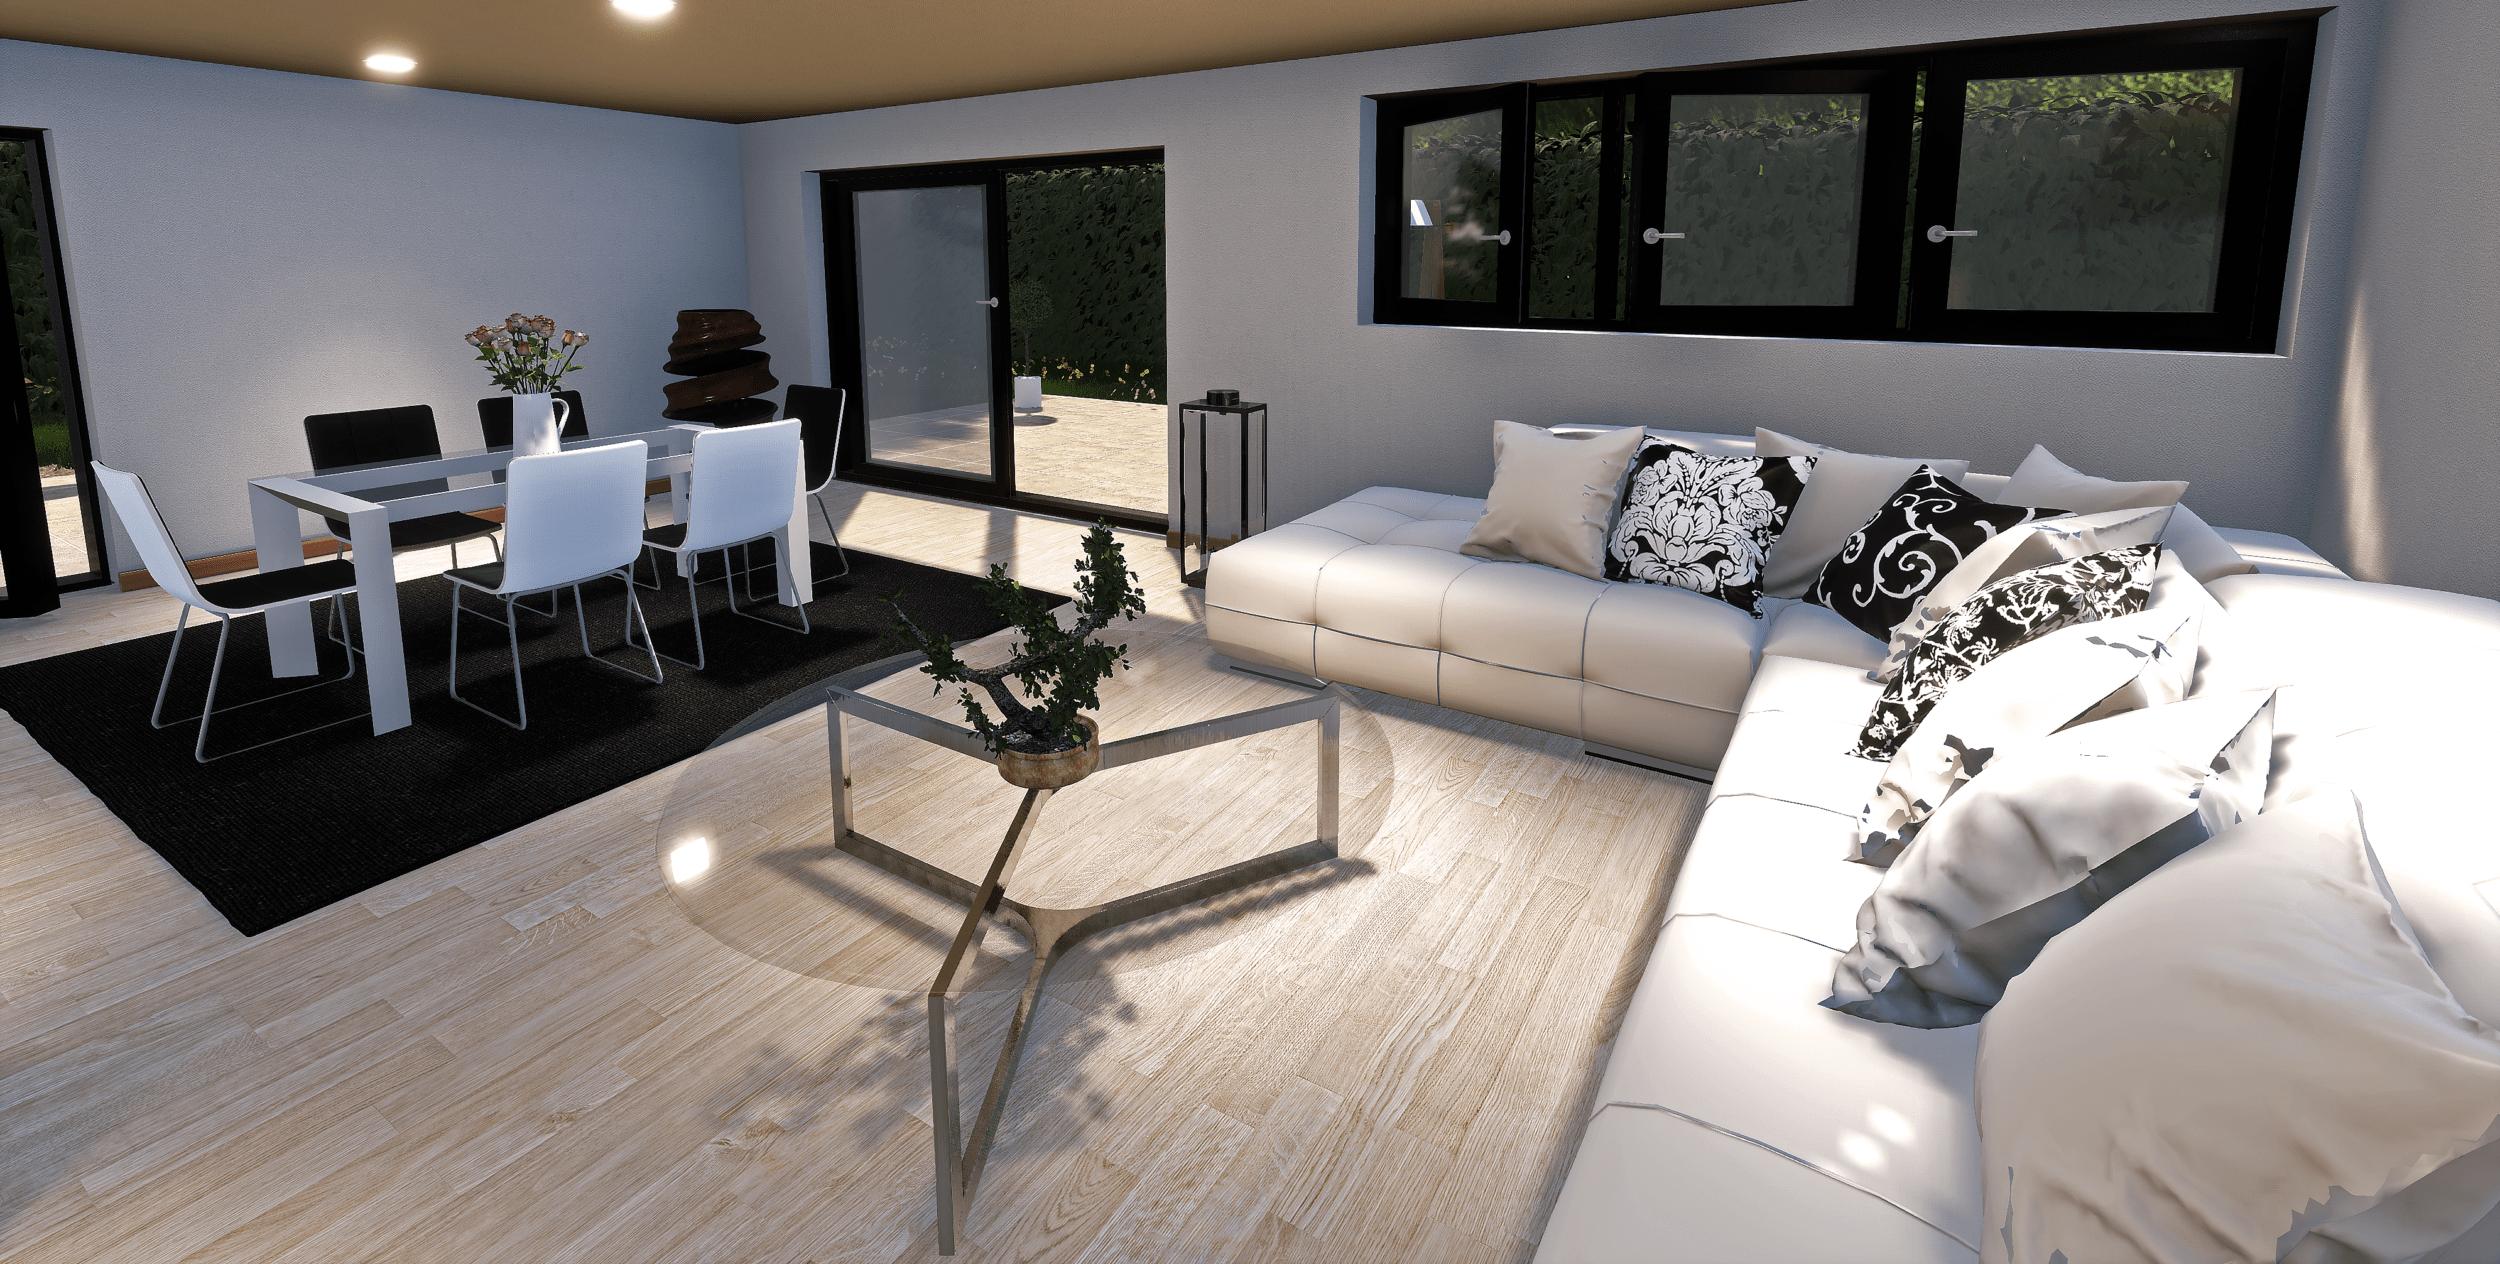 3D modeling - 3D rendering - Real estate promotion - Les Marronniers